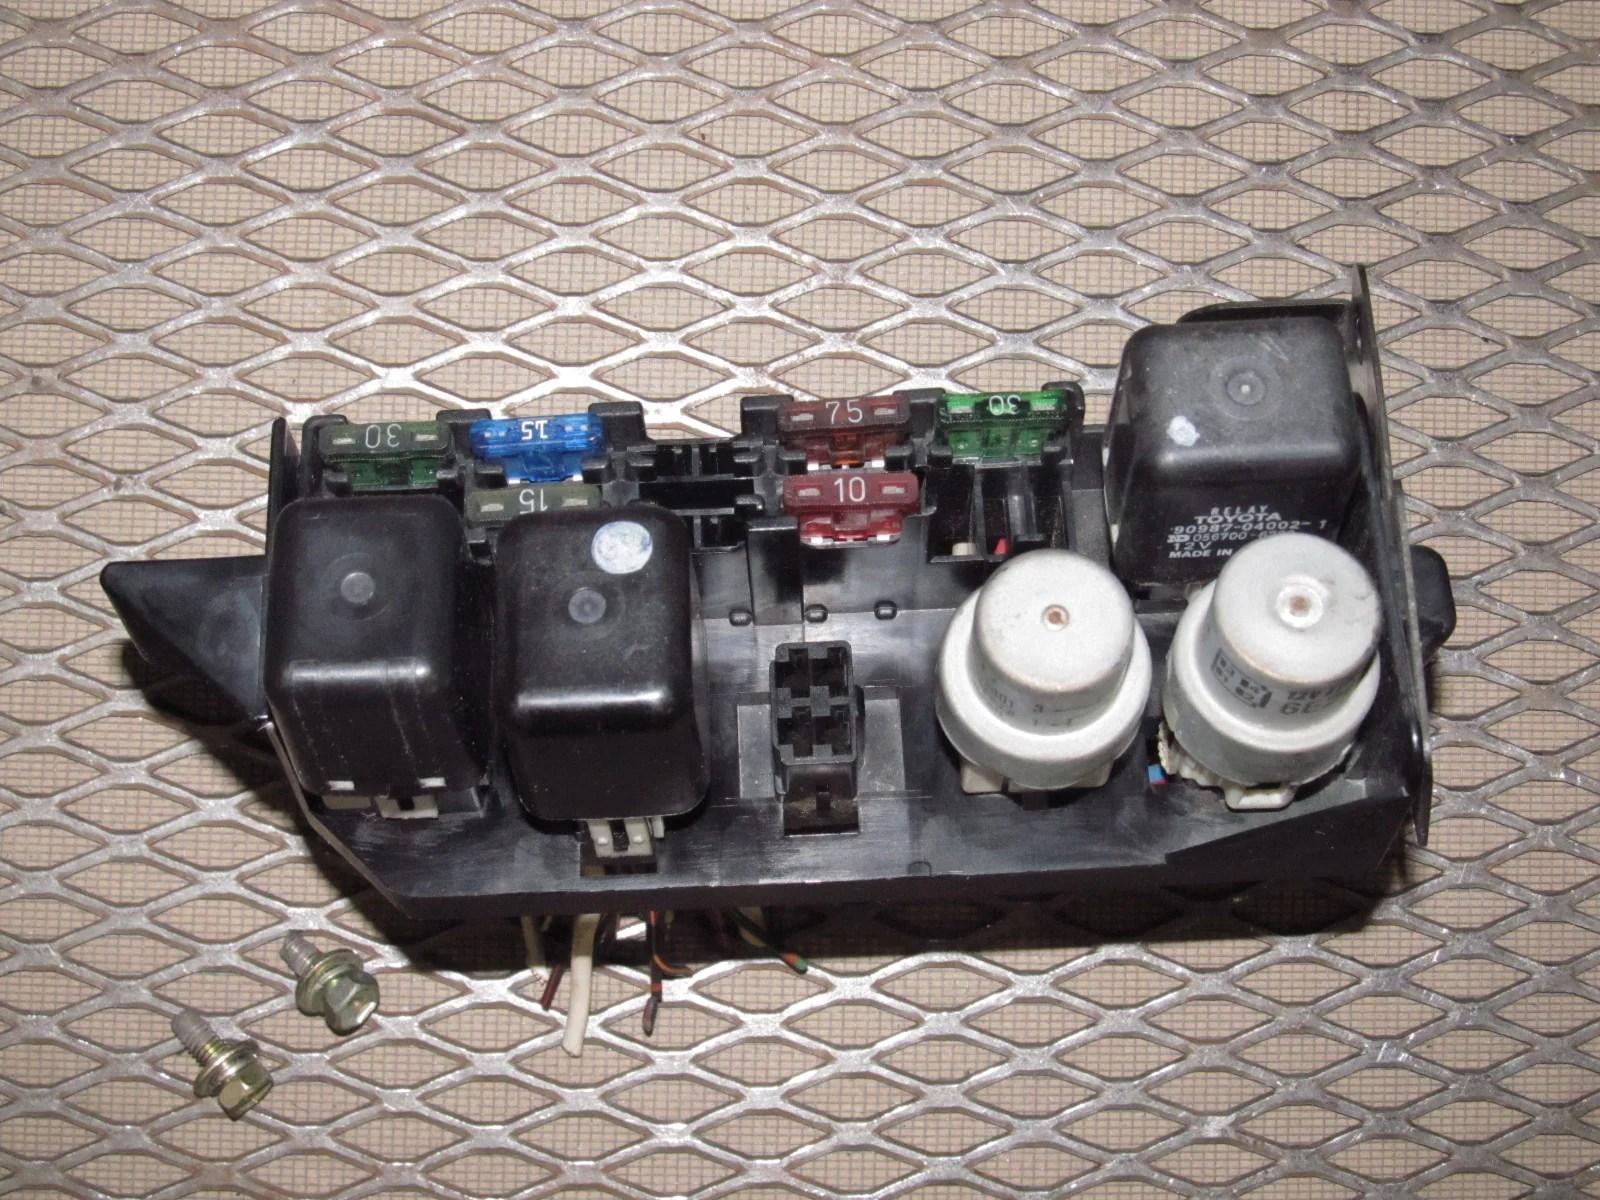 hight resolution of mr2 fuse box wiring diagram g985 mr2 fuse box wiring library diagram experts vehicle fuse box